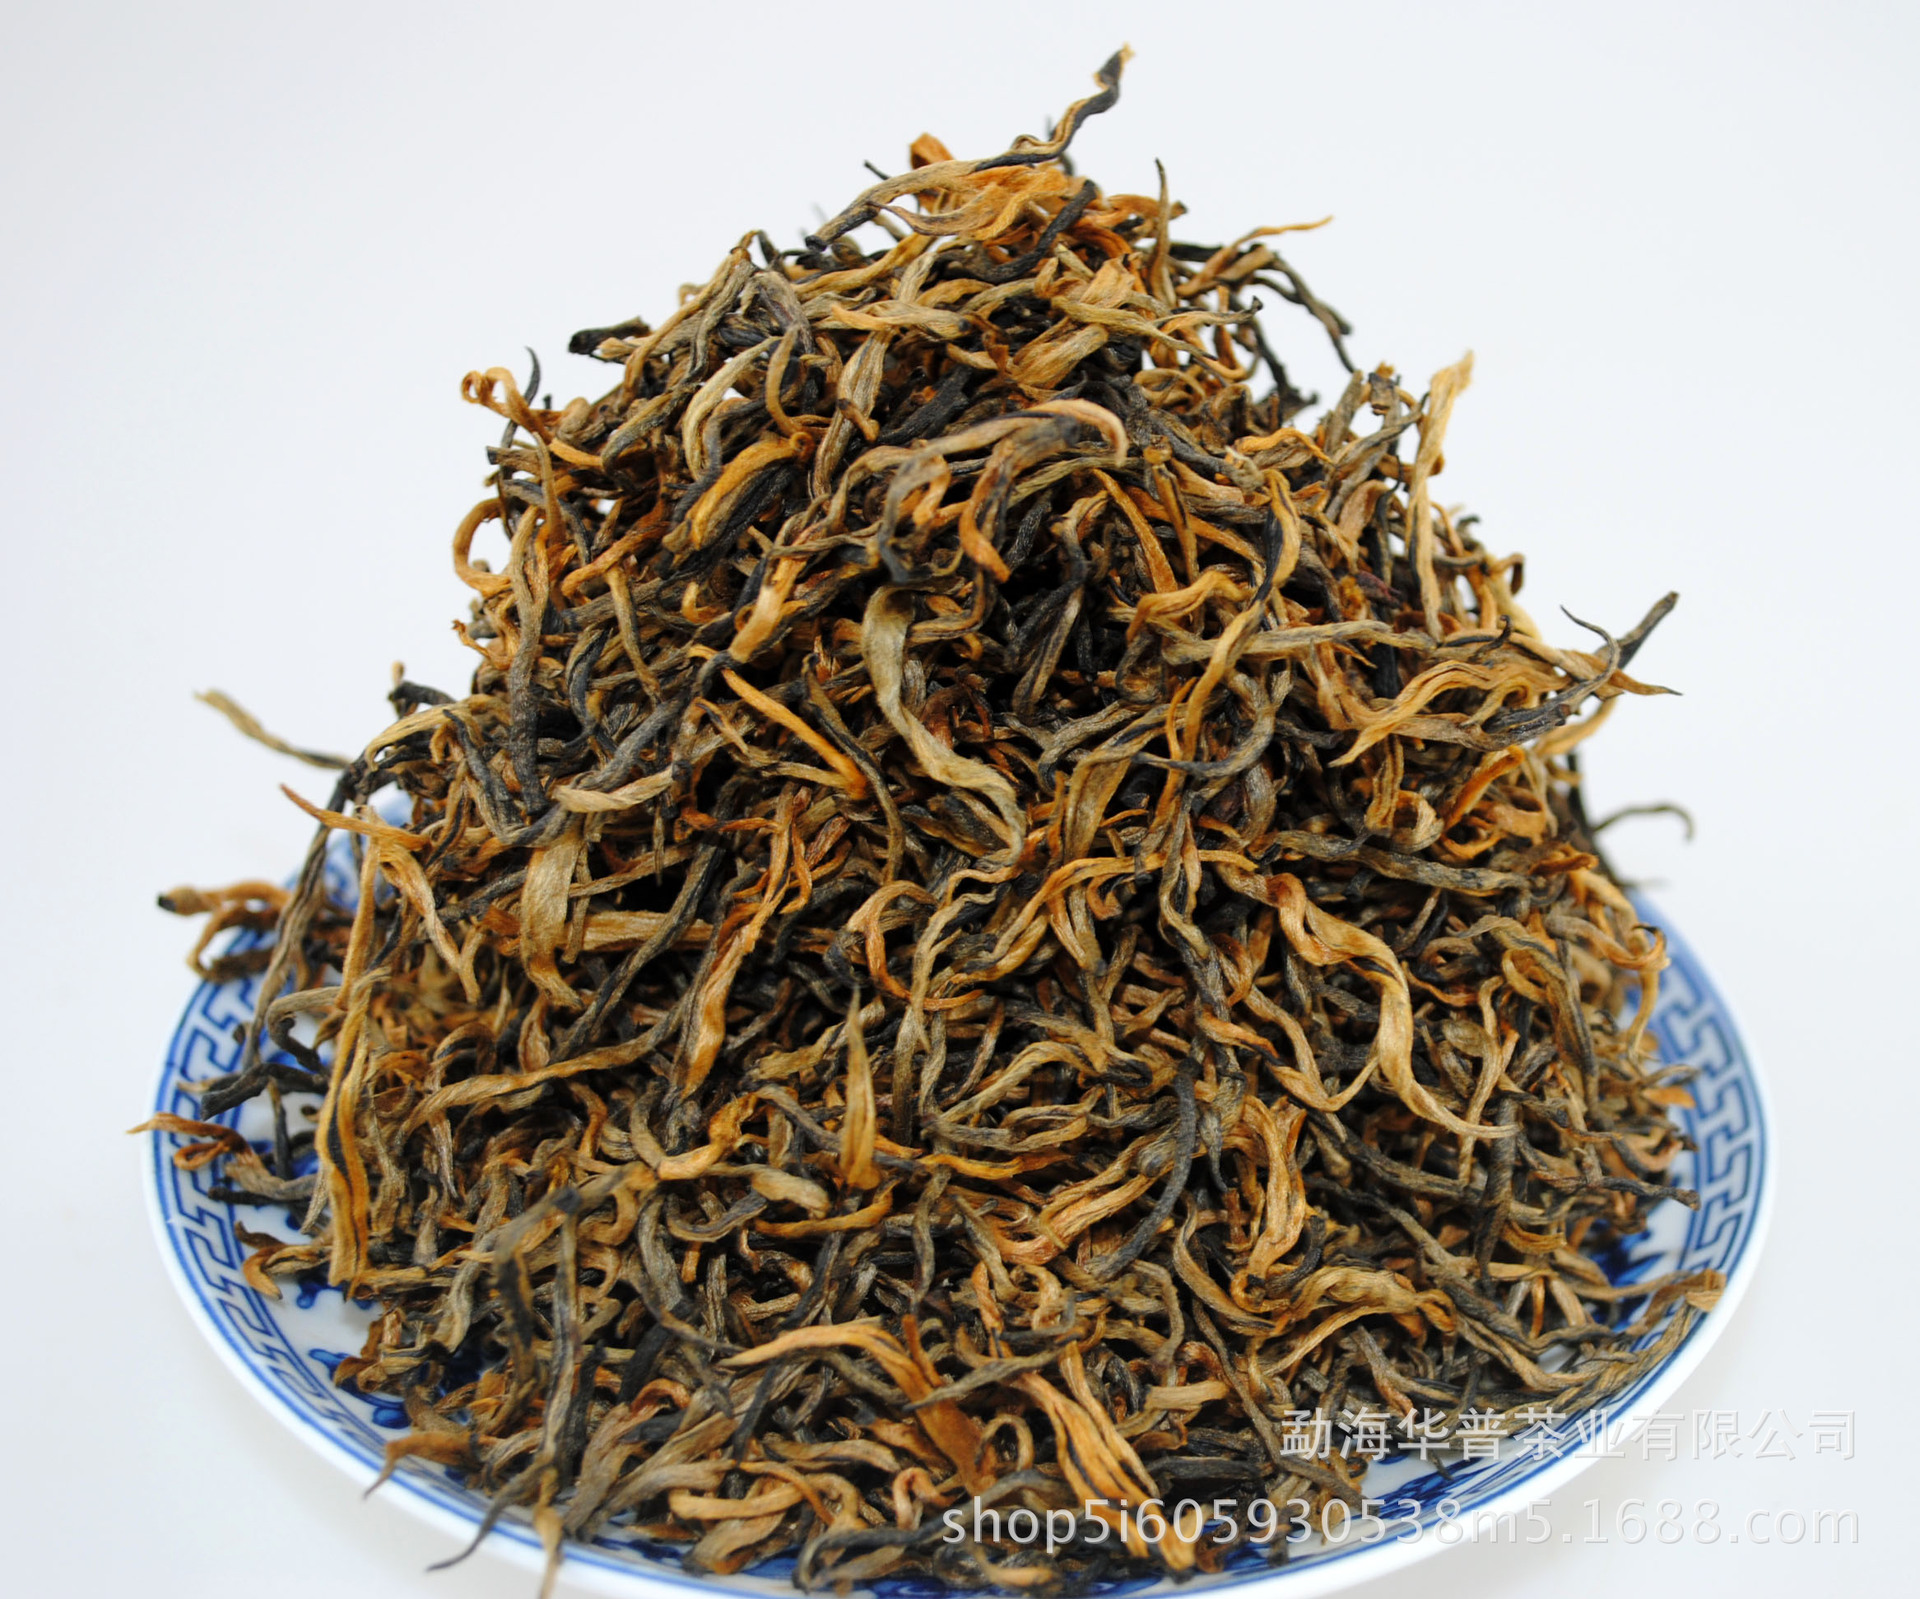 Wholesale Chinses Yunnan 100% natural Ancient Tree slimming health Black Tea - 4uTea | 4uTea.com